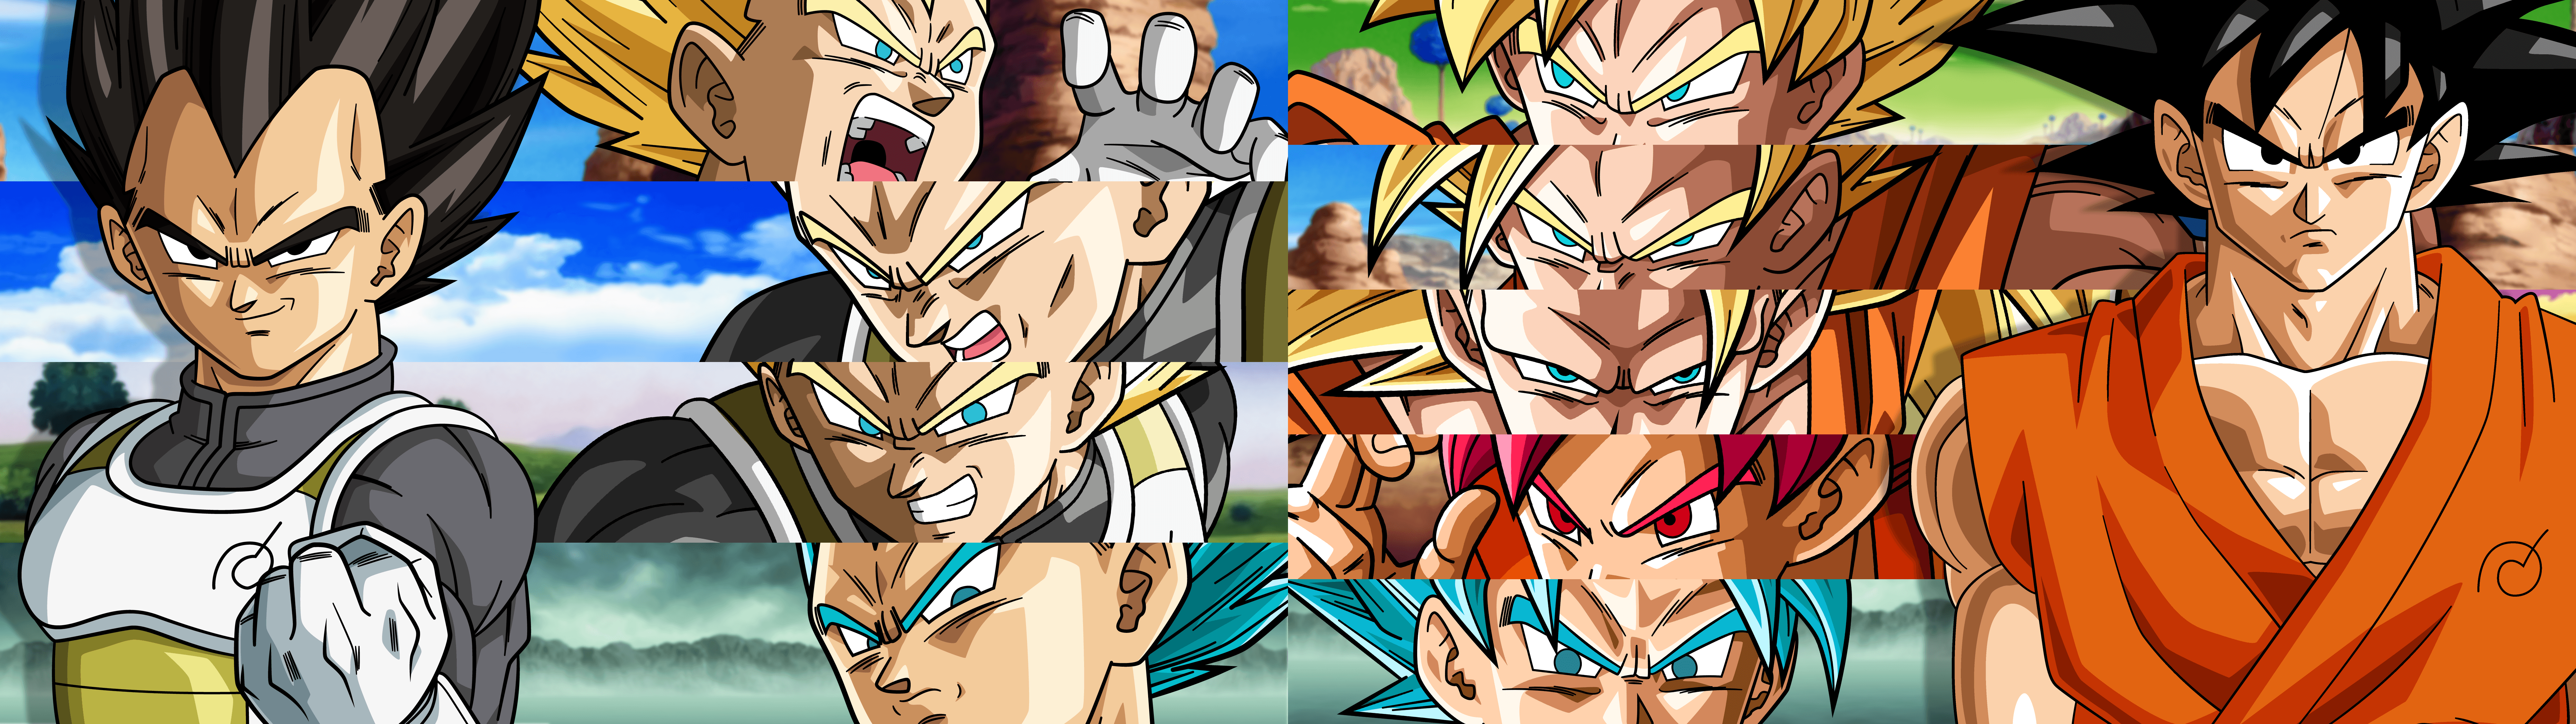 Goku Transformations Wallpapers Wallpaper Cave